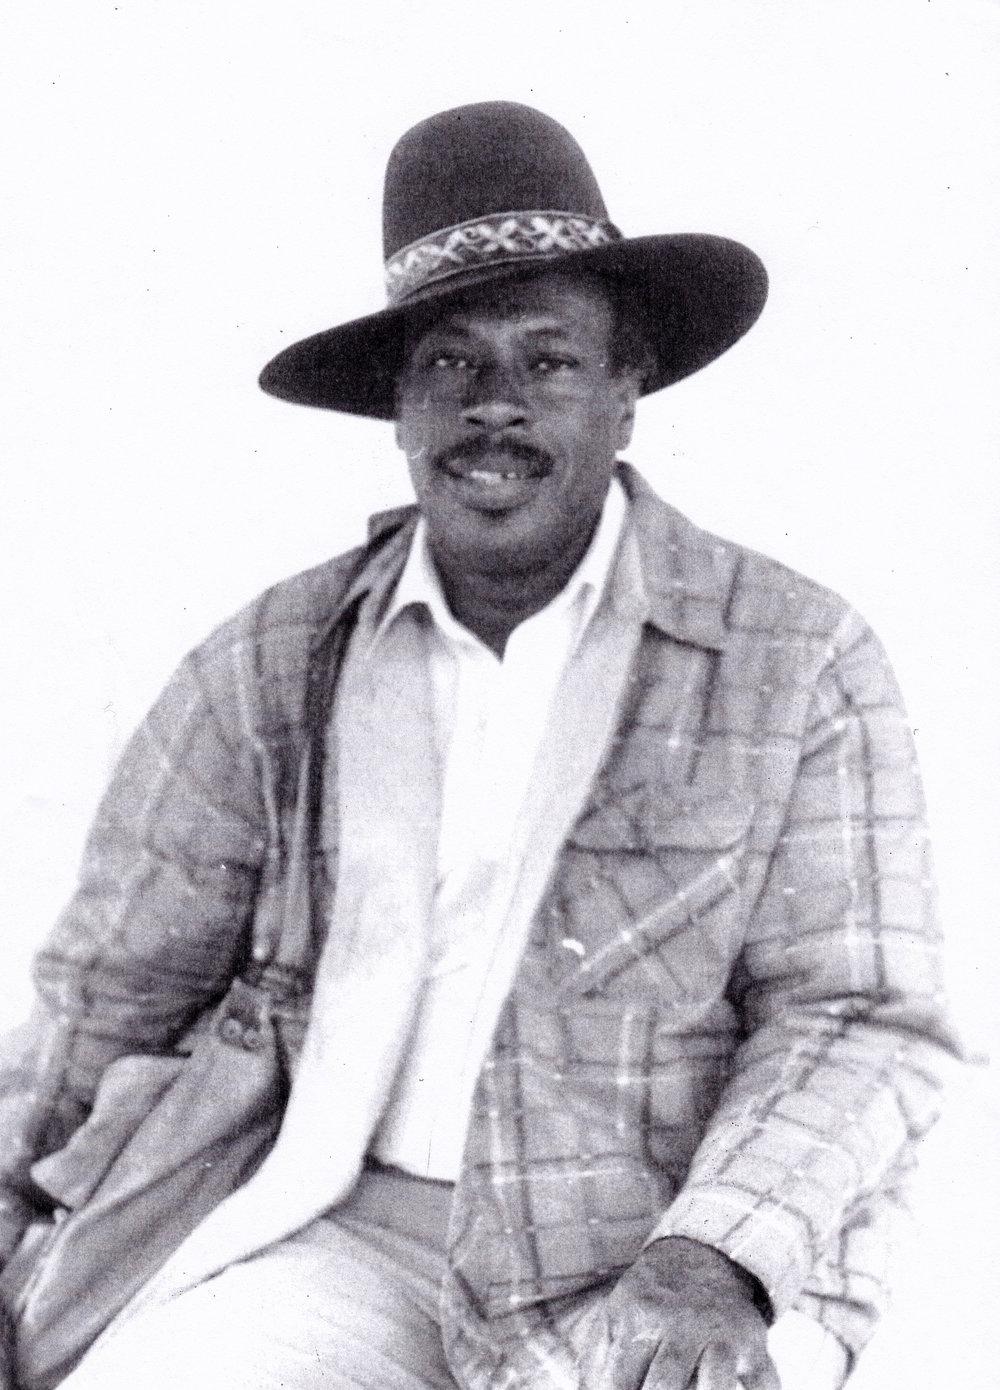 Photograph of artist Earl Cooke